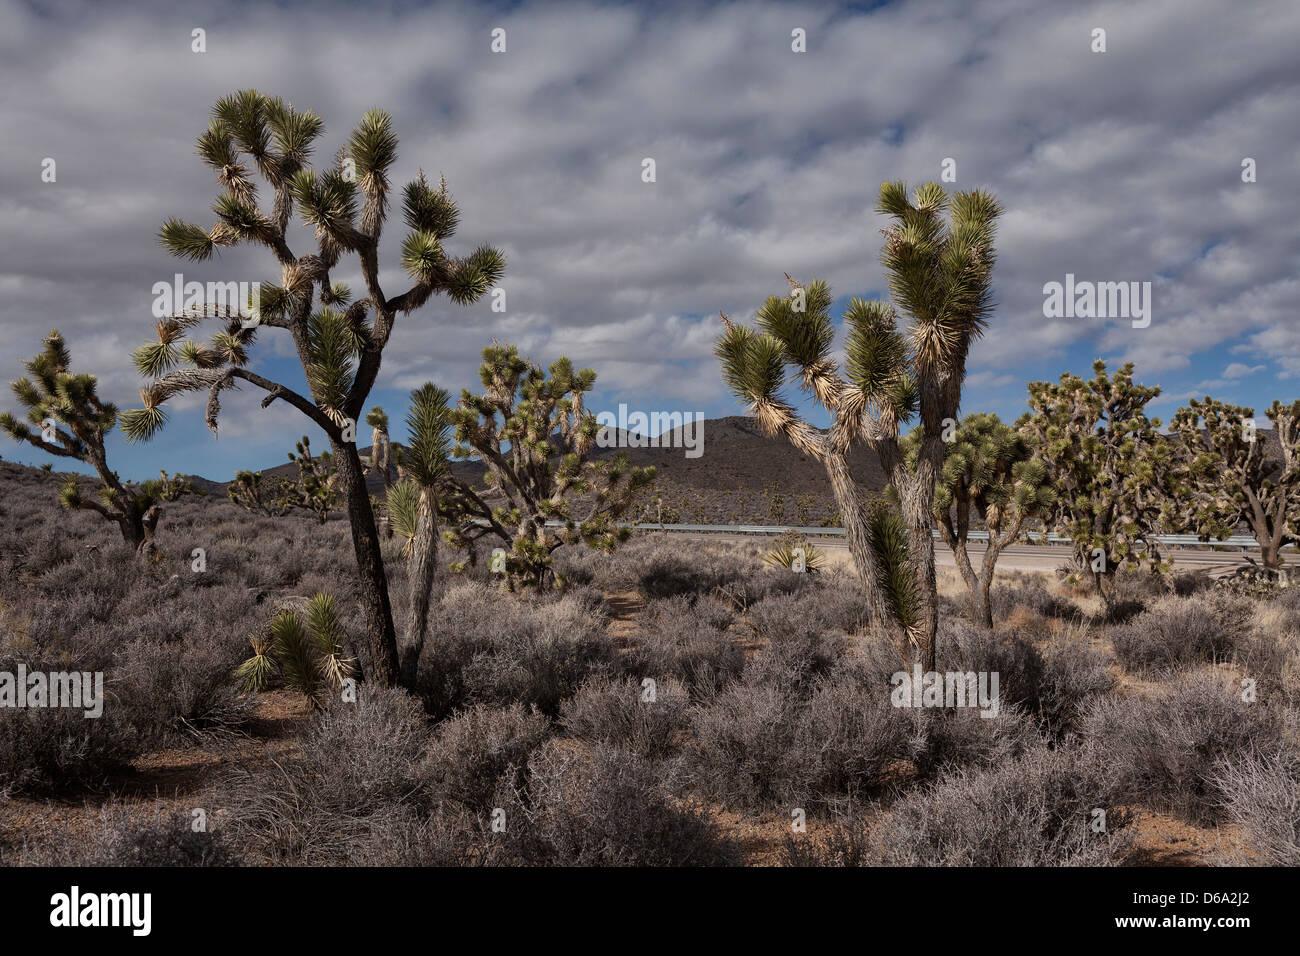 Joshua Bäume in der trockenen Landschaft Stockbild